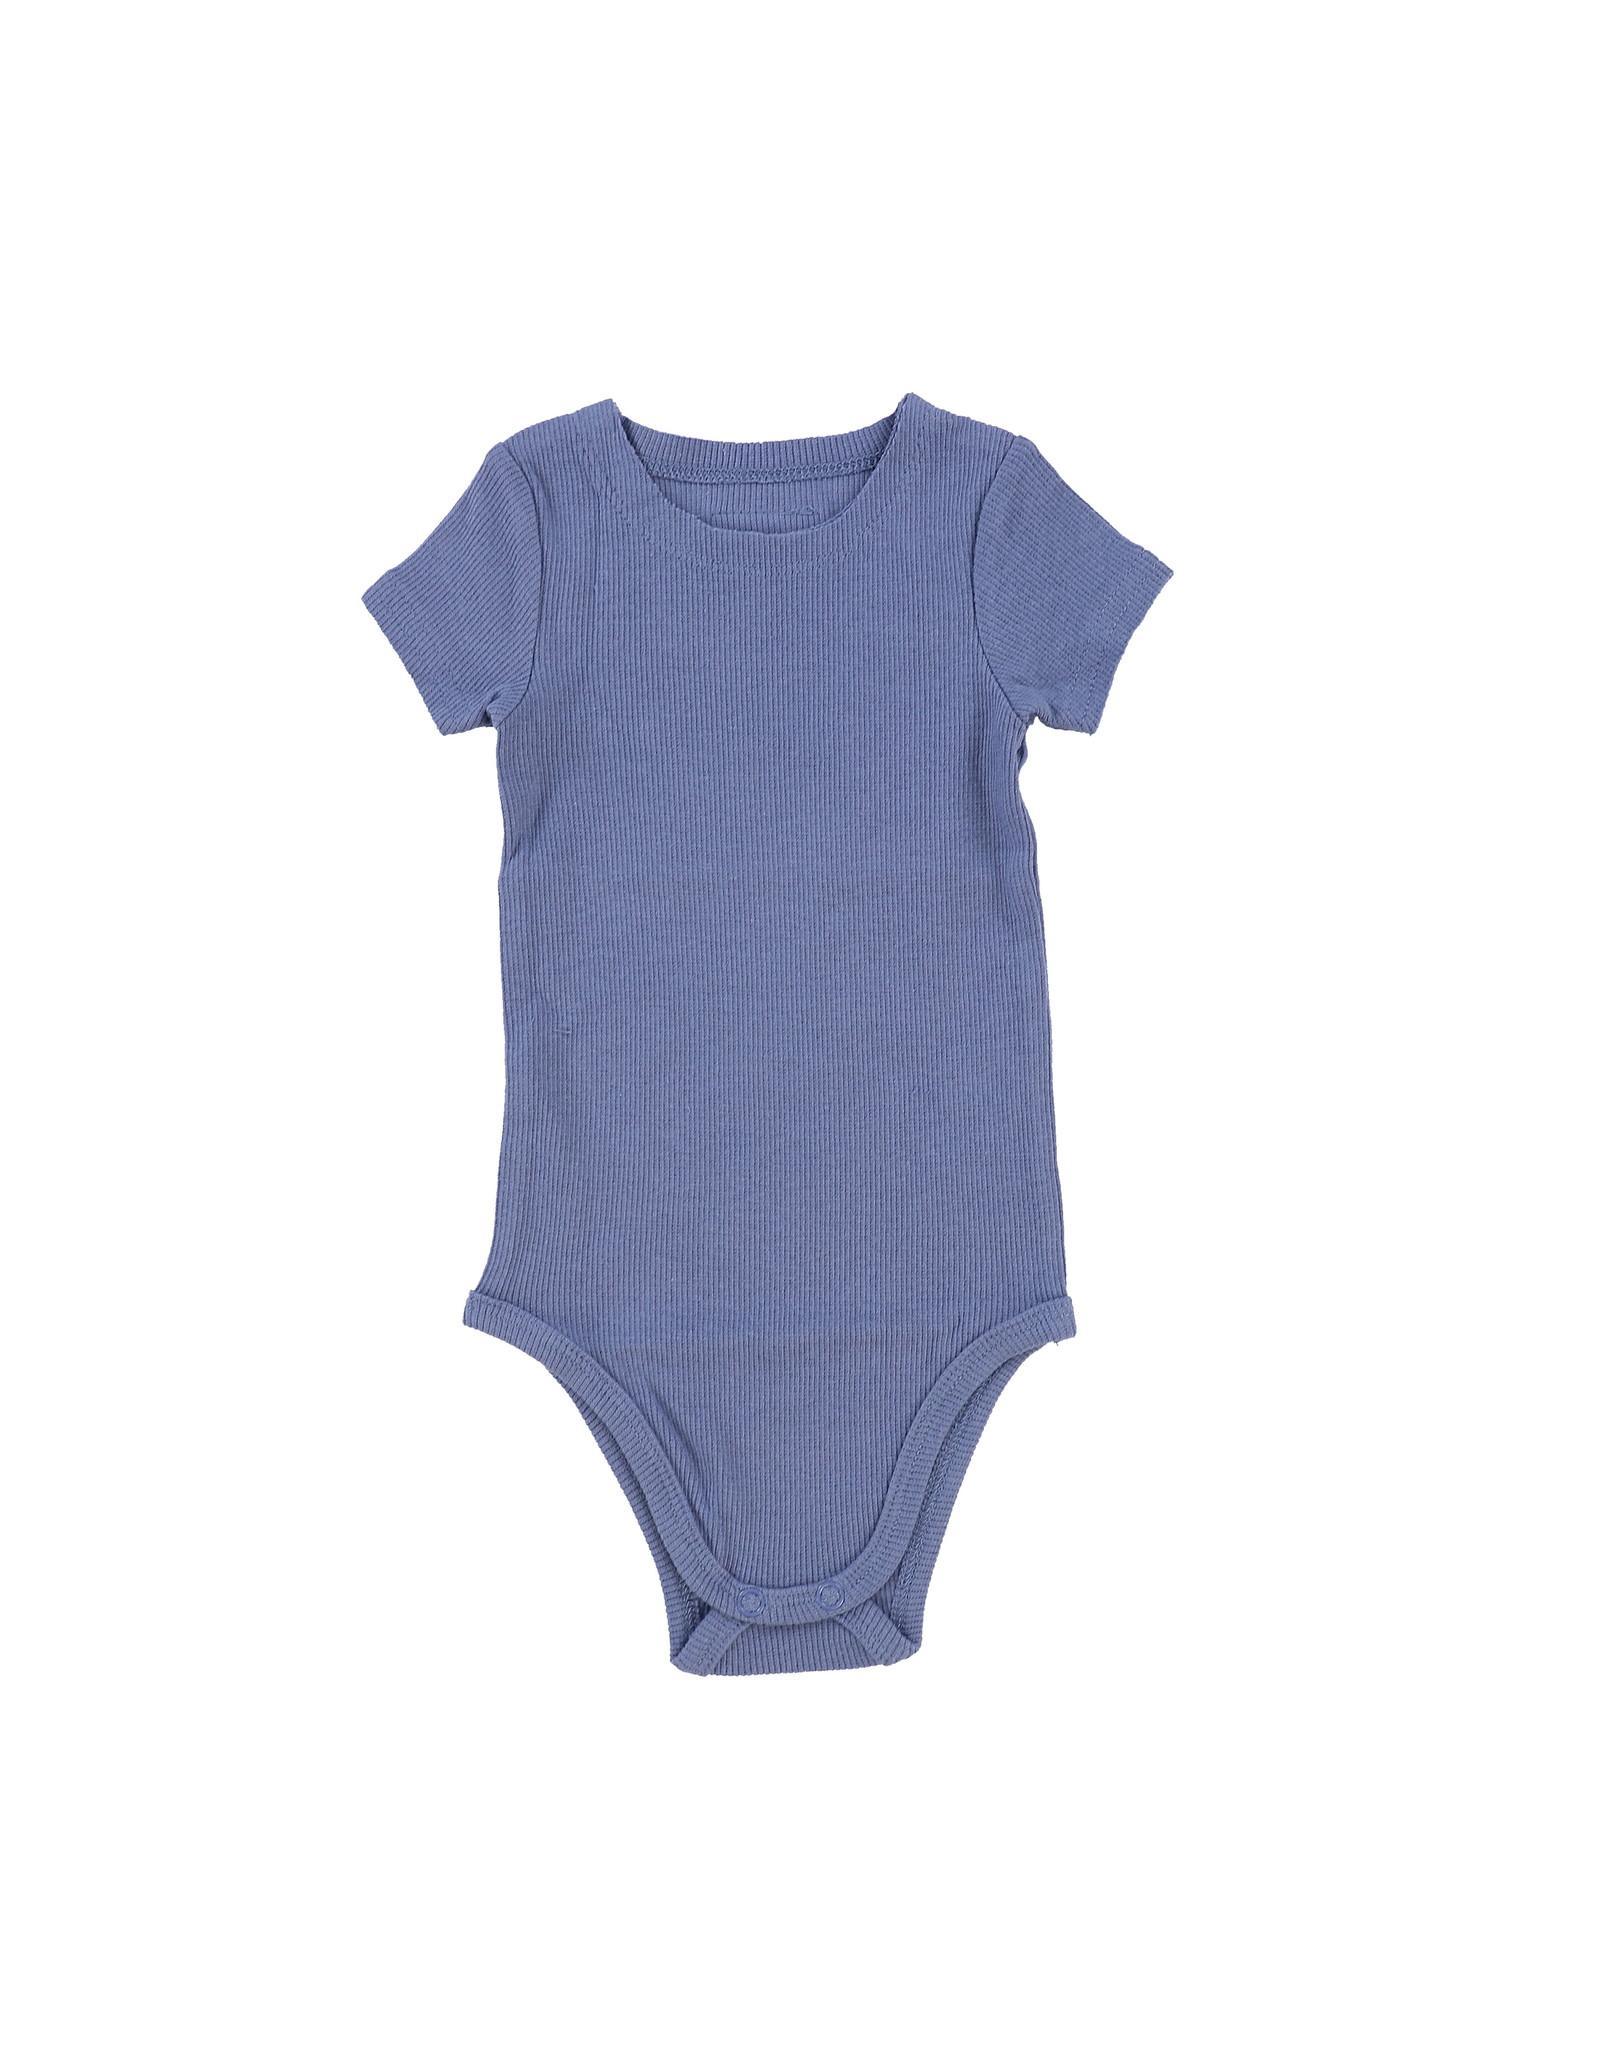 LIL LEGS SS20 Short Sleeve Rib Onesie